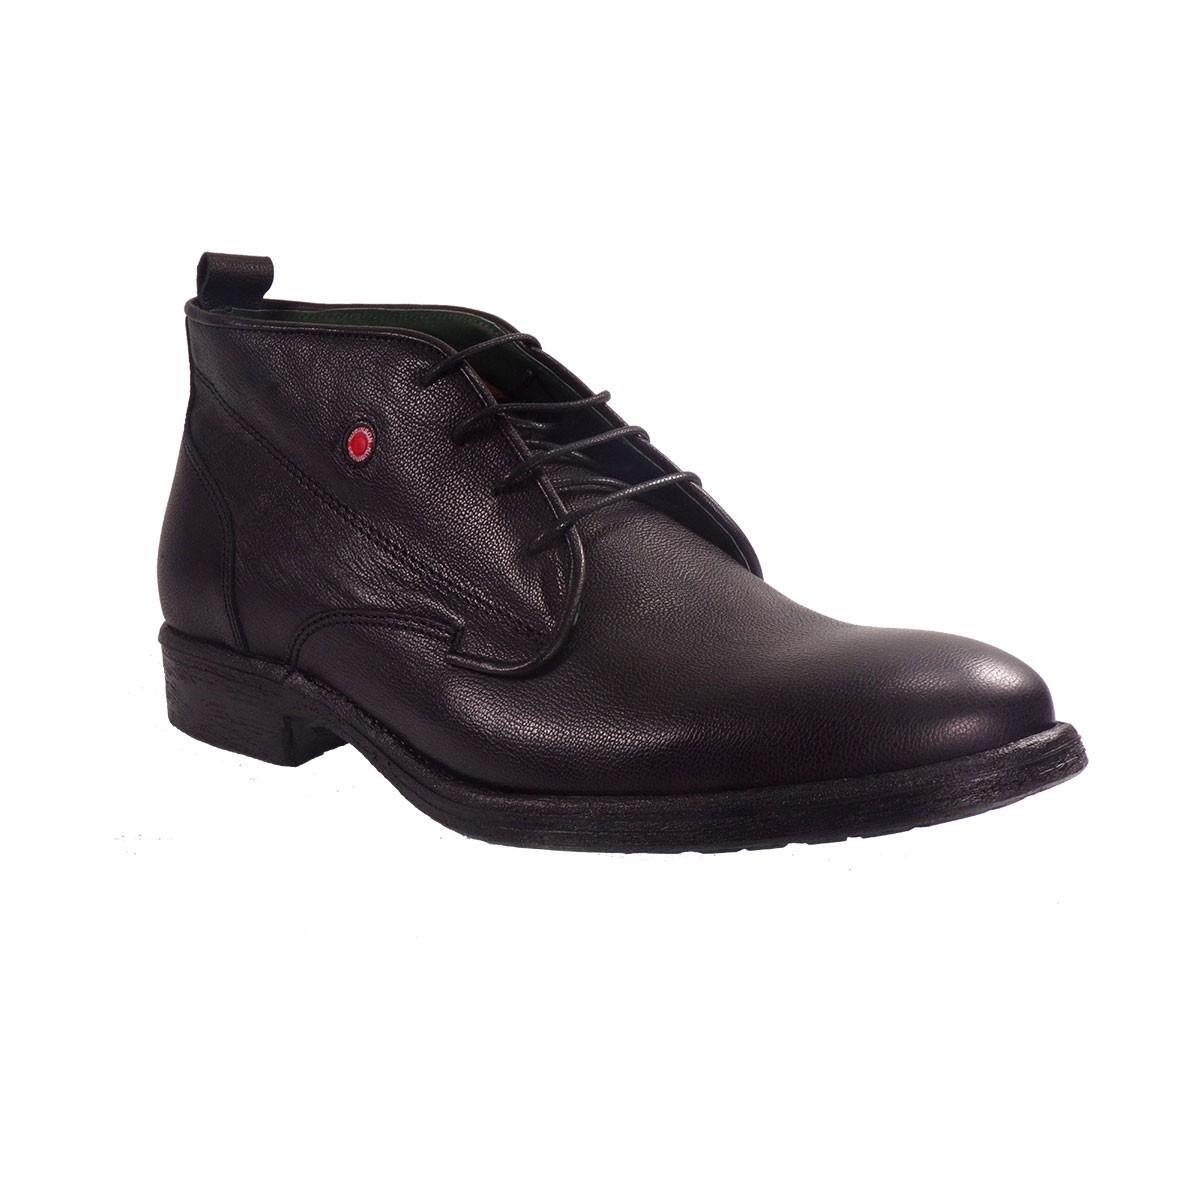 Robinson Ανδρικά Παπούτσια Μποτάκια Αρβυλάκια 1796 Μαύρο Δέρμα